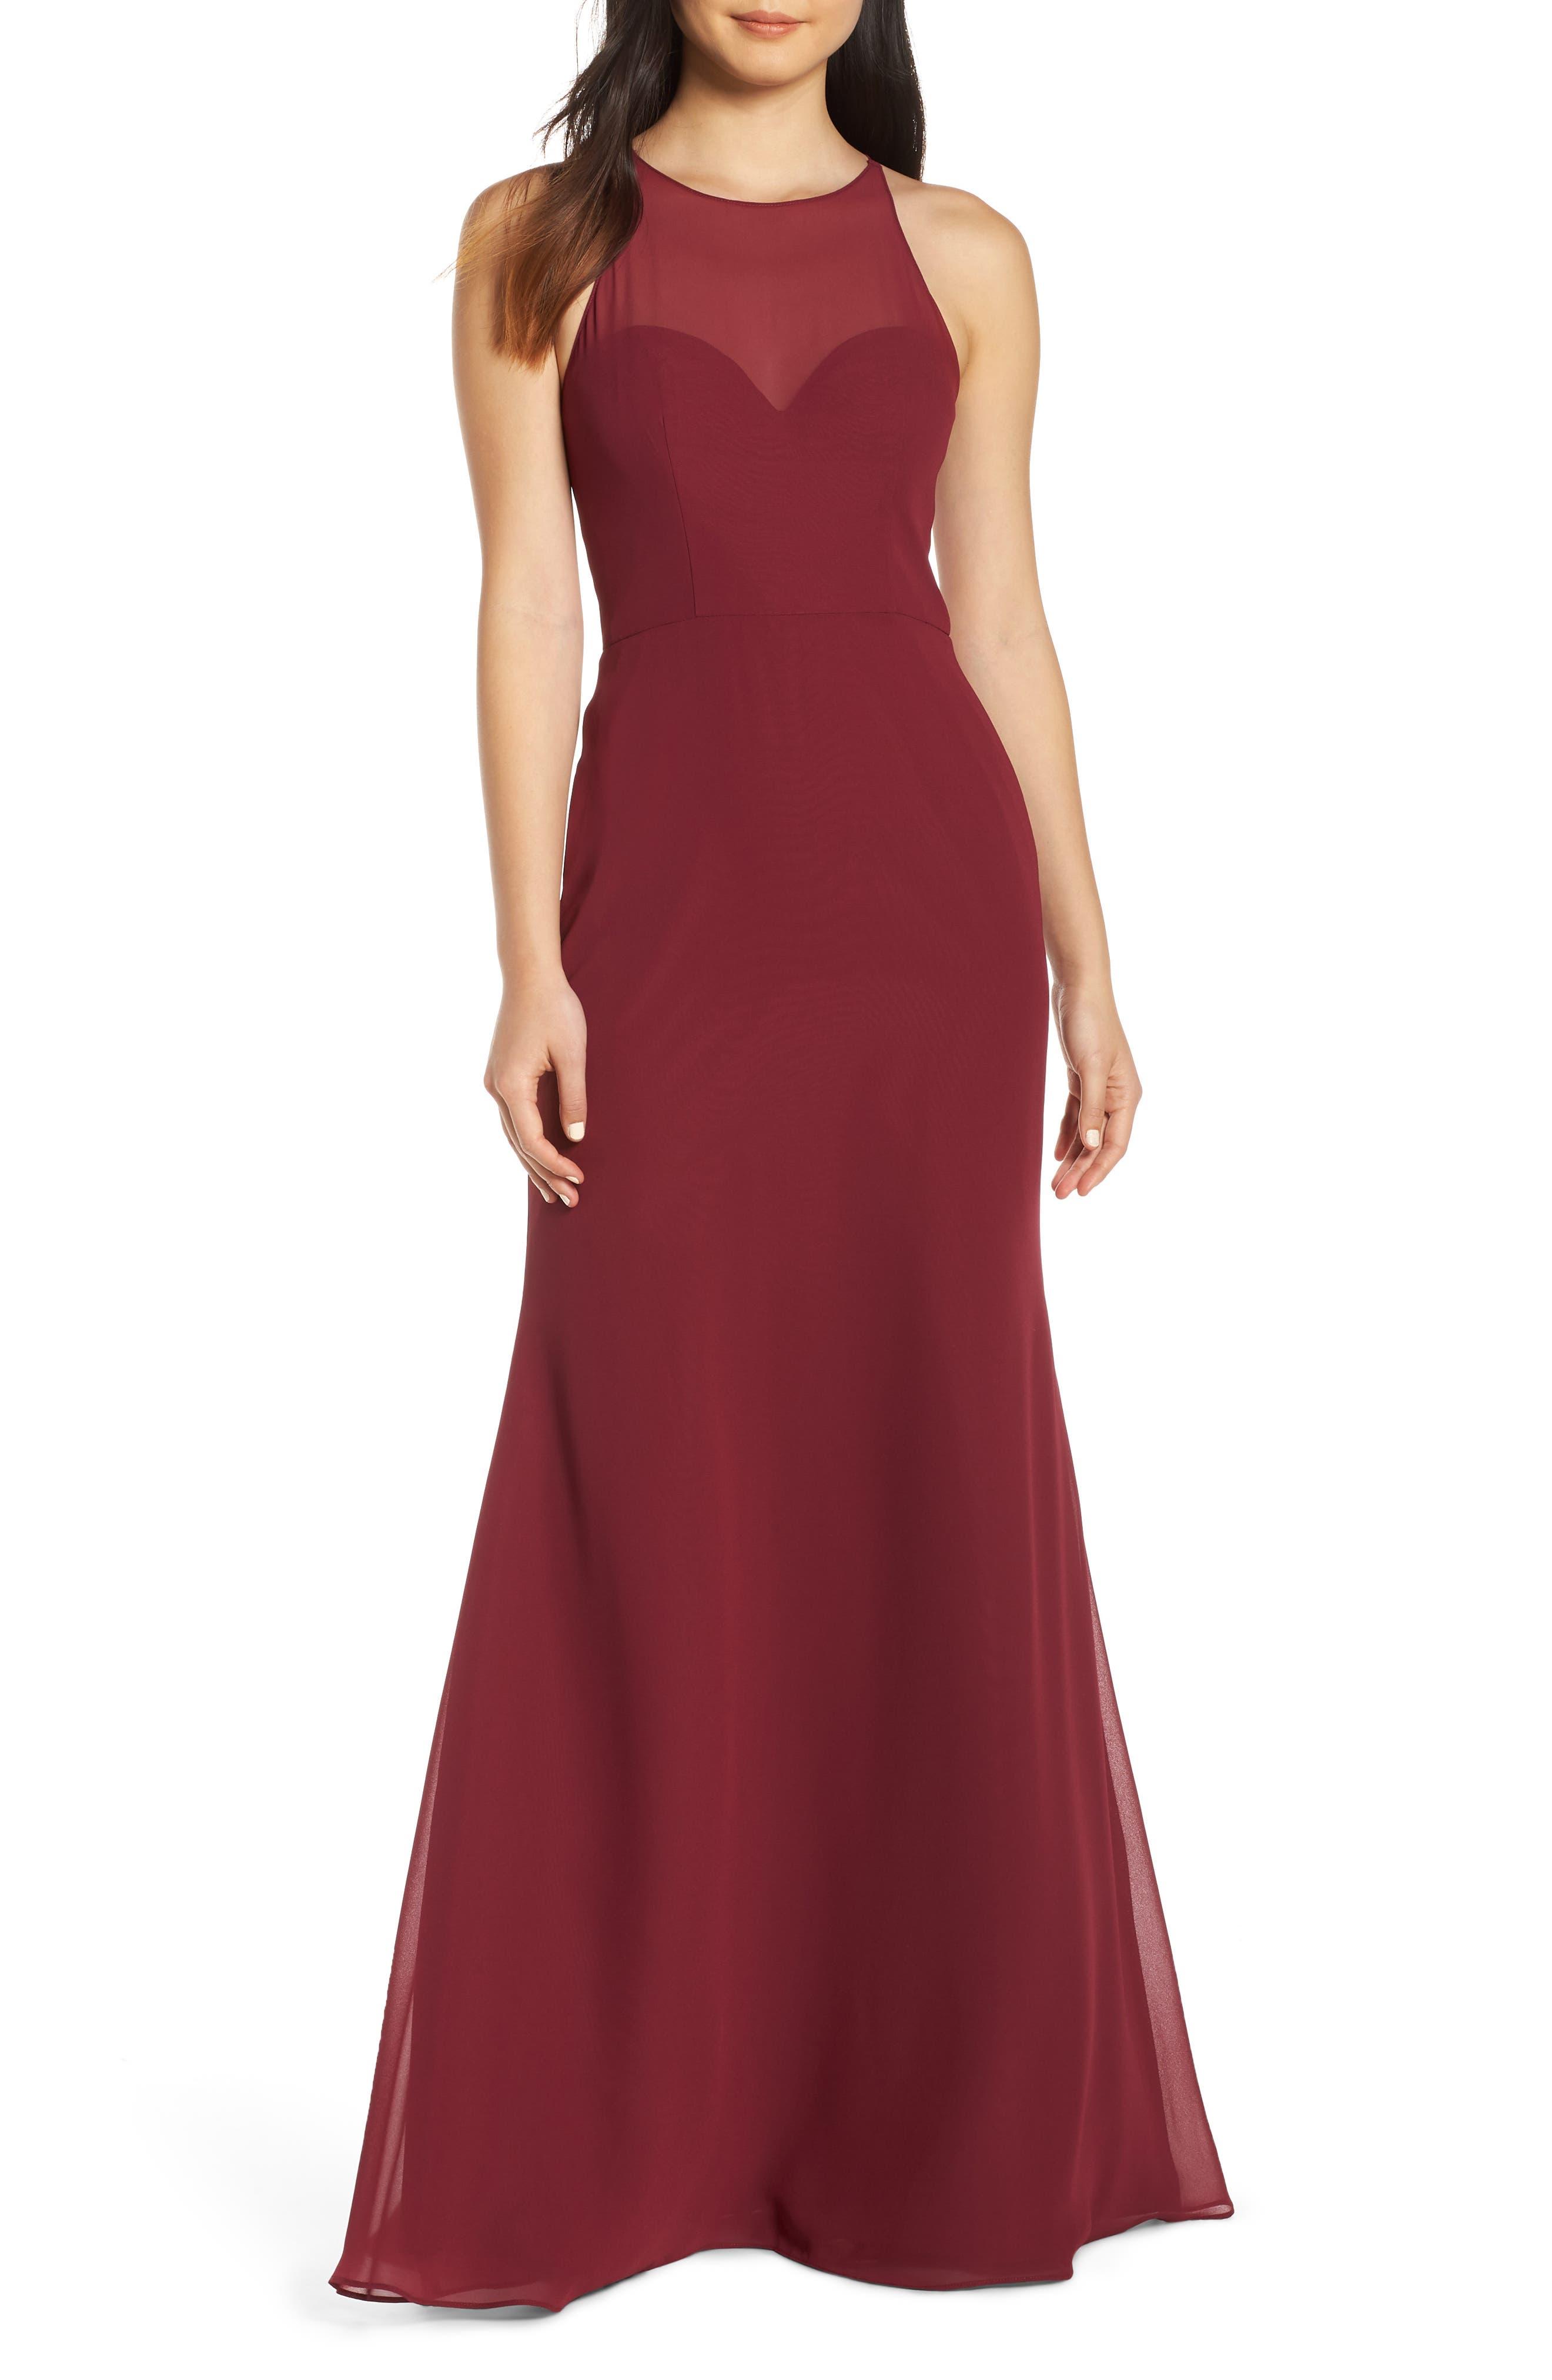 Hayley Paige Occasions Sheer Racerback Chiffon Evening Dress, Burgundy